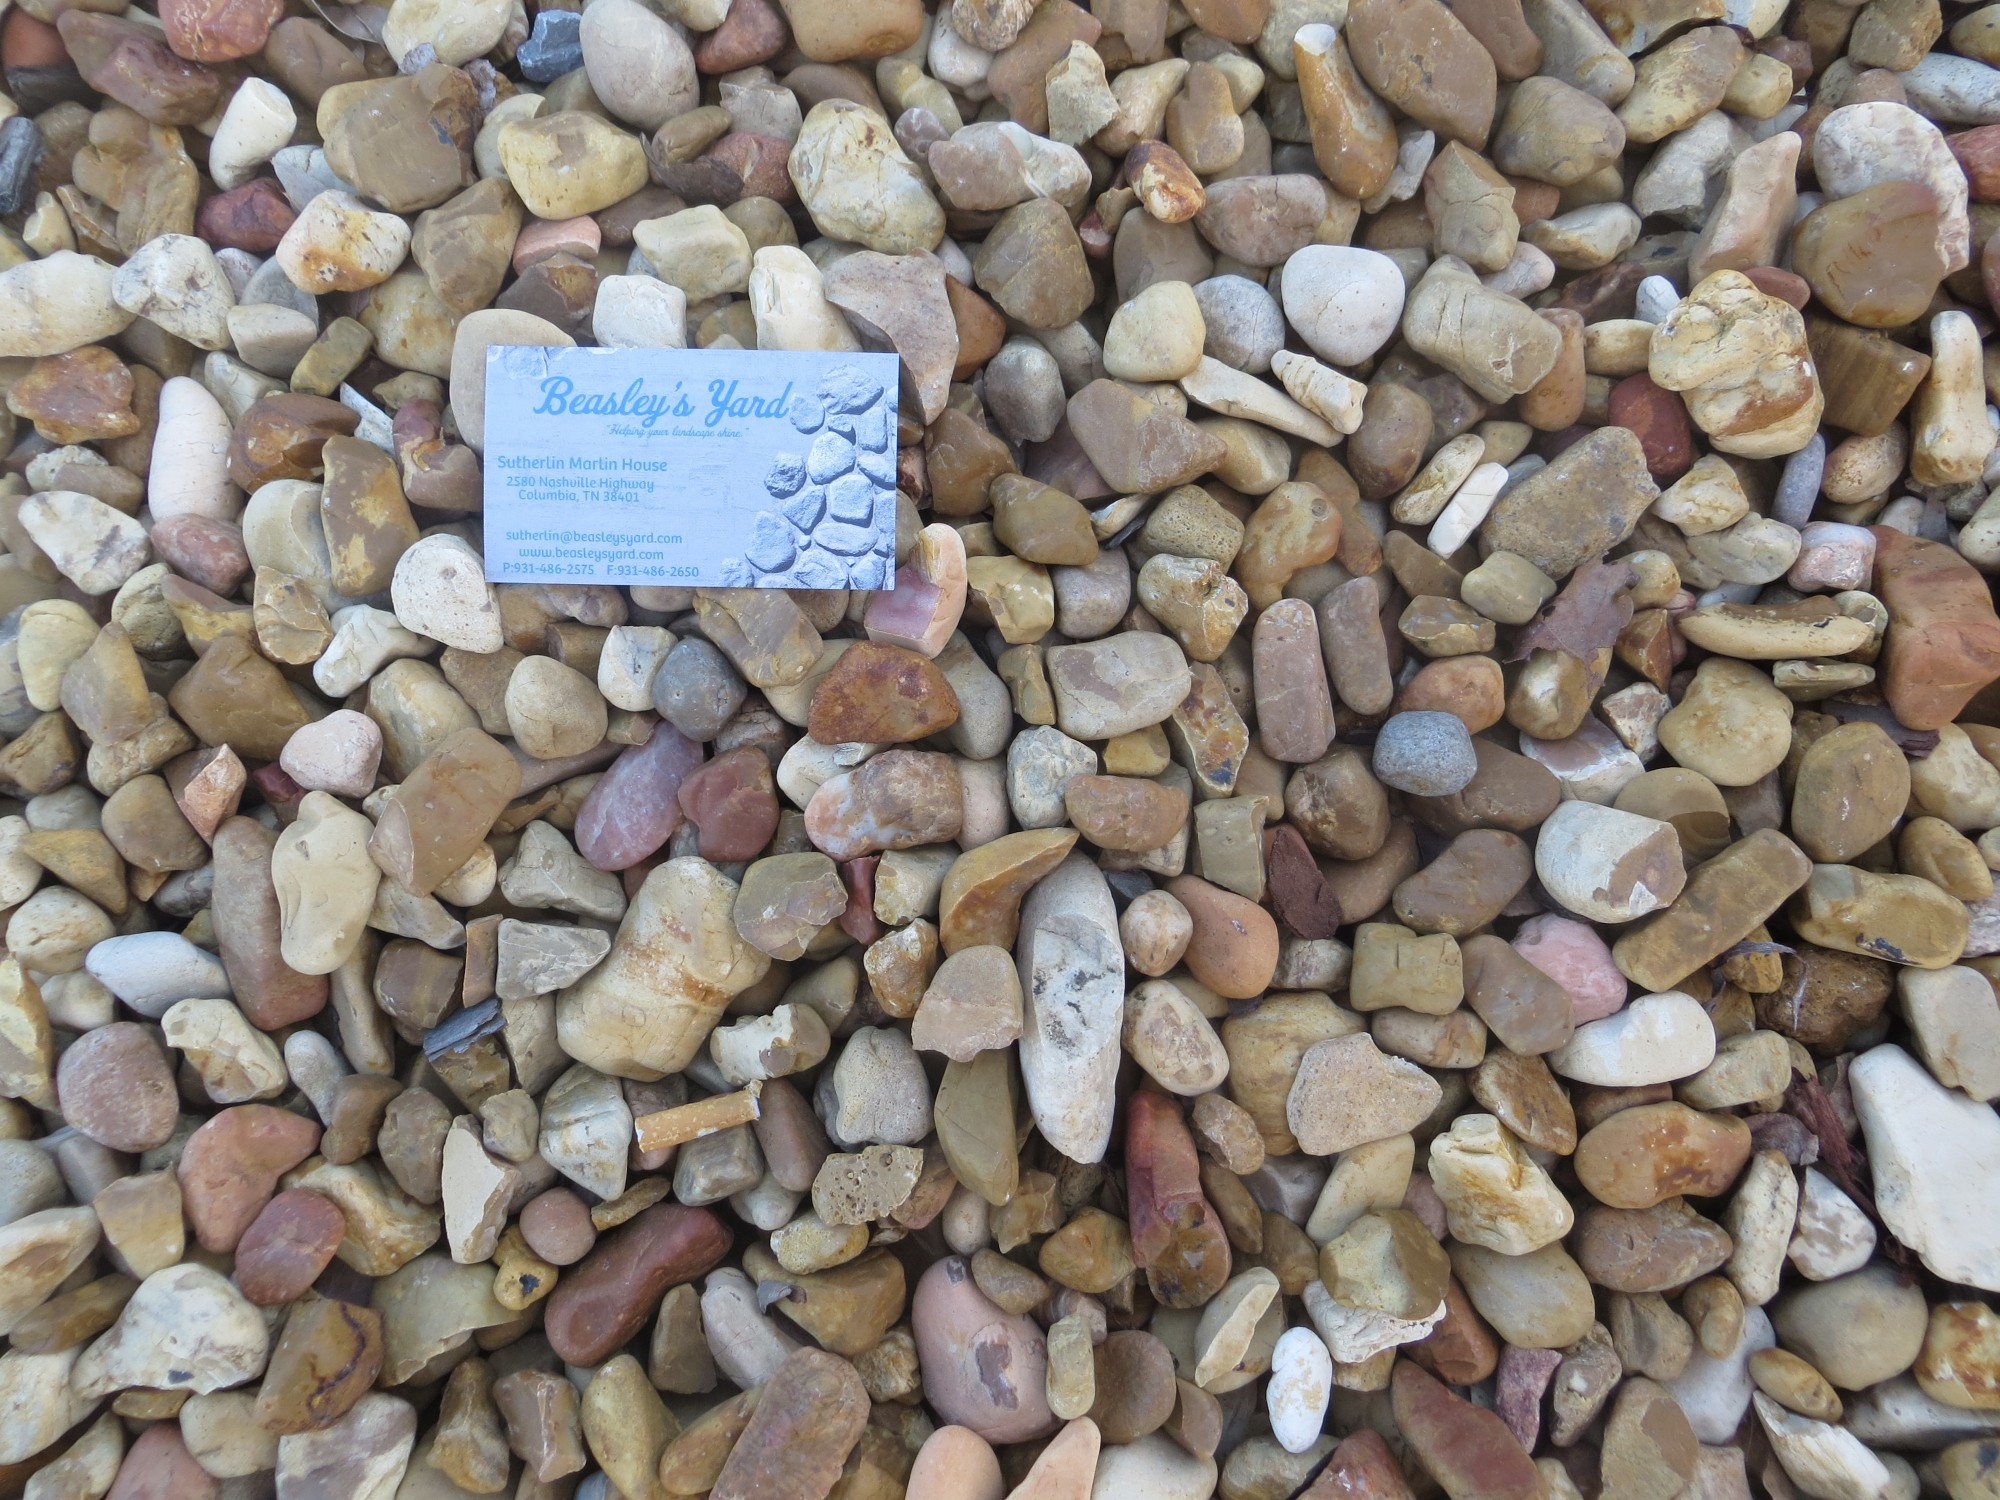 stunning garden decorative concept decor bridges gravel image and illinois style small pebbles supply landscape for